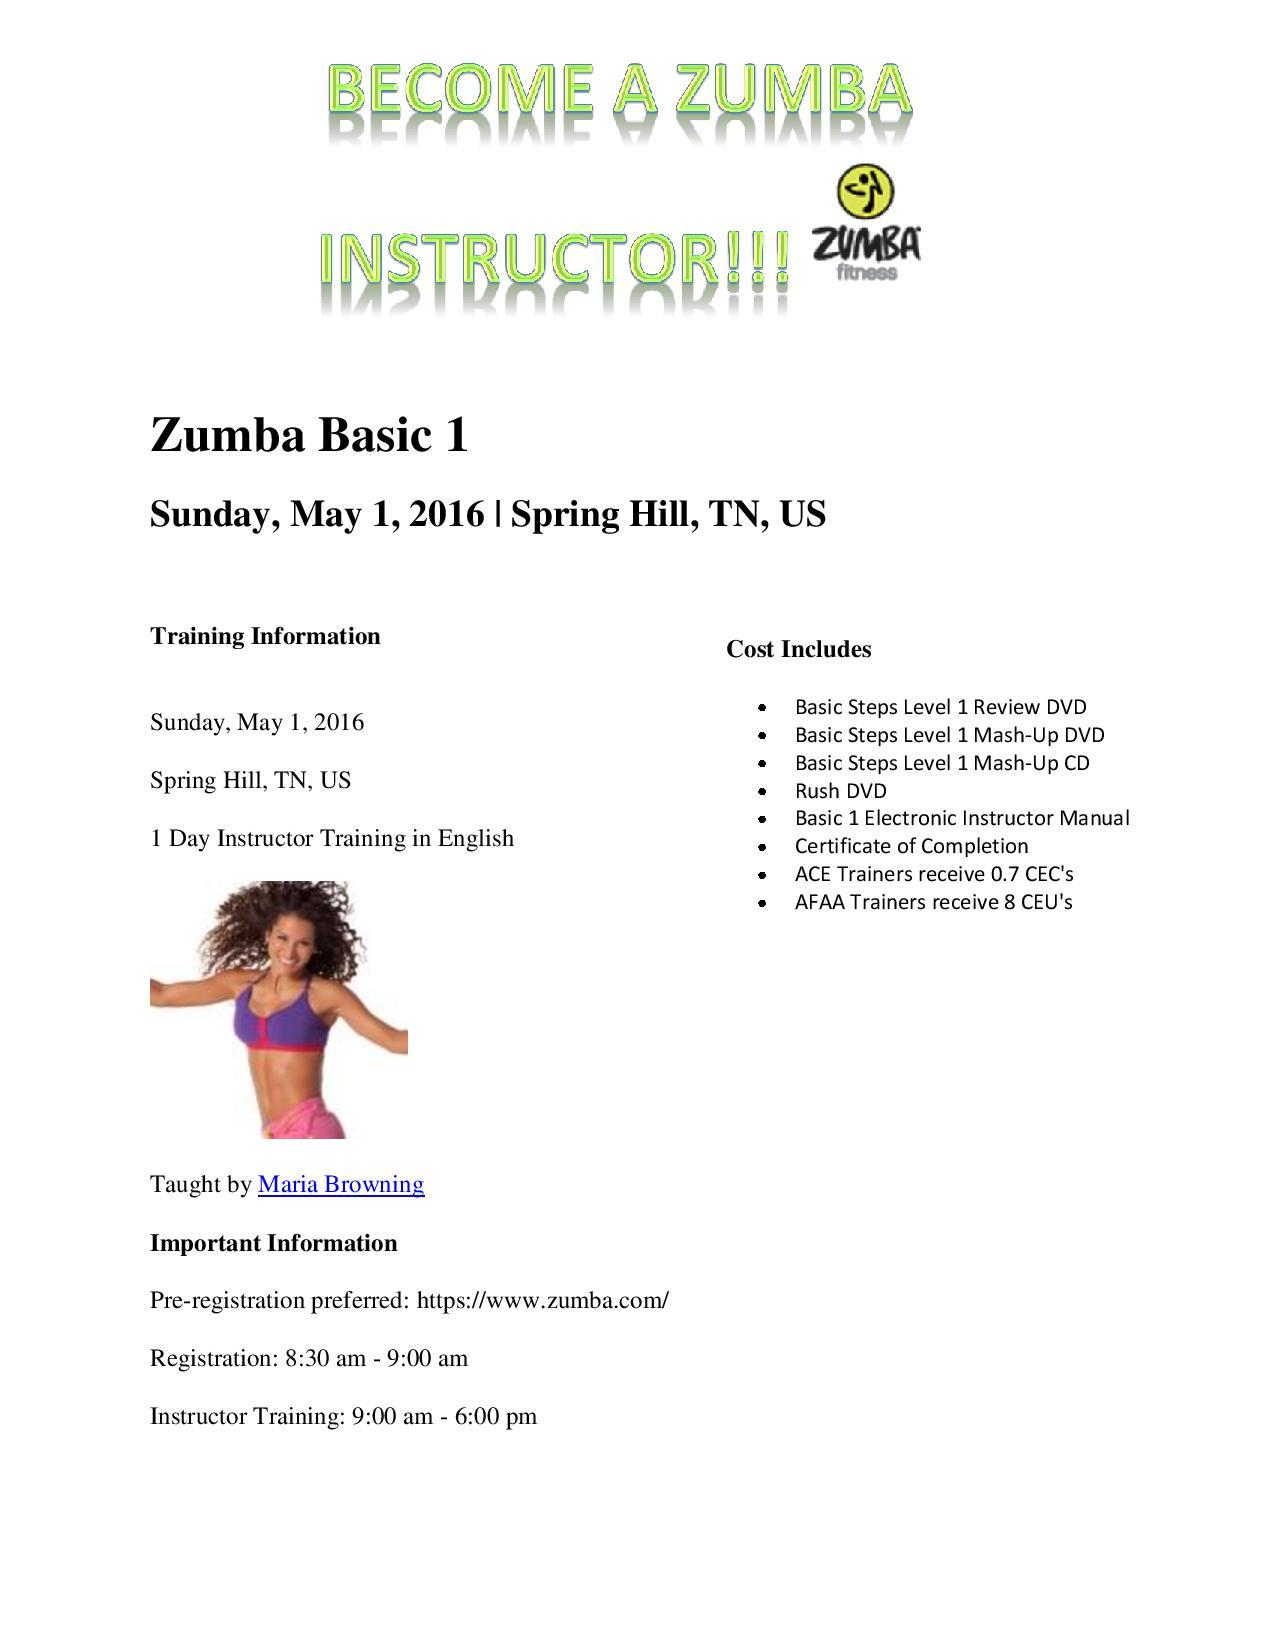 Zumba Instructor Training - Zumba Basic 1 - Spring Hill Fitness 24/7 Gym